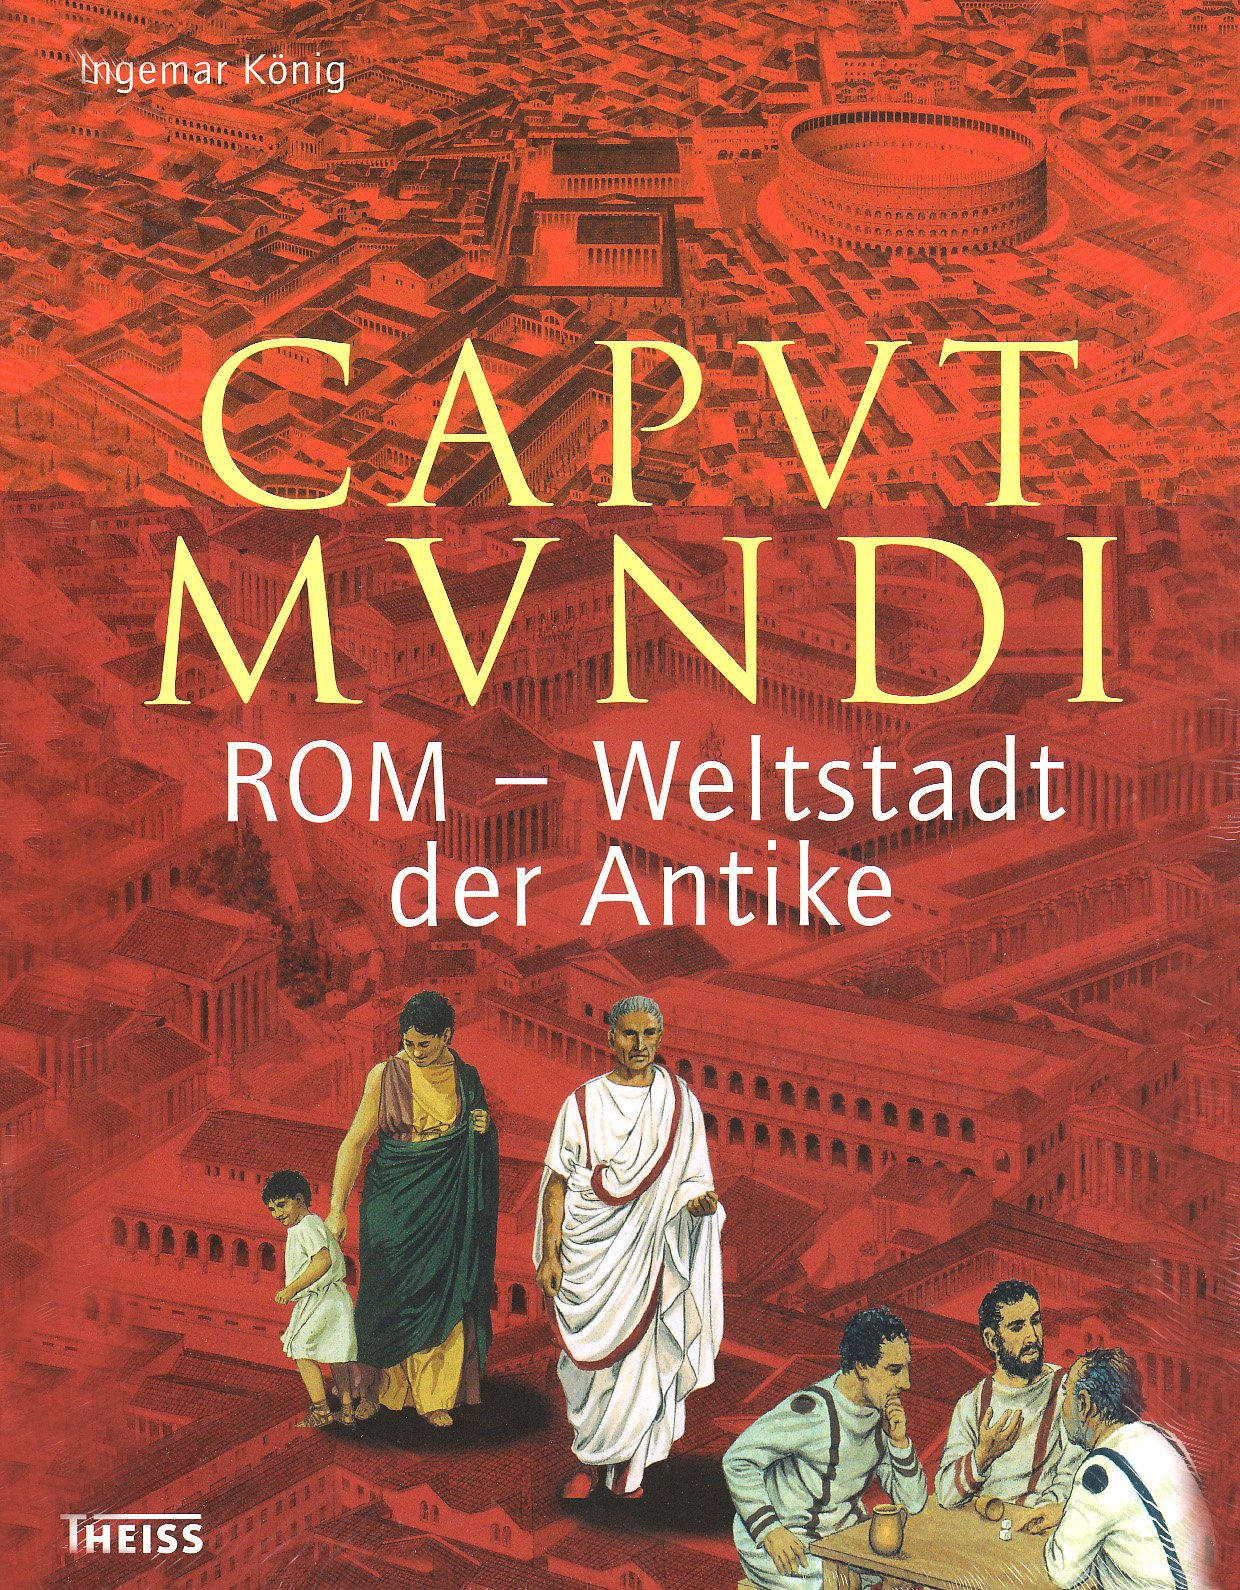 Caput Mundi: Rom - Weltstadt der Antike